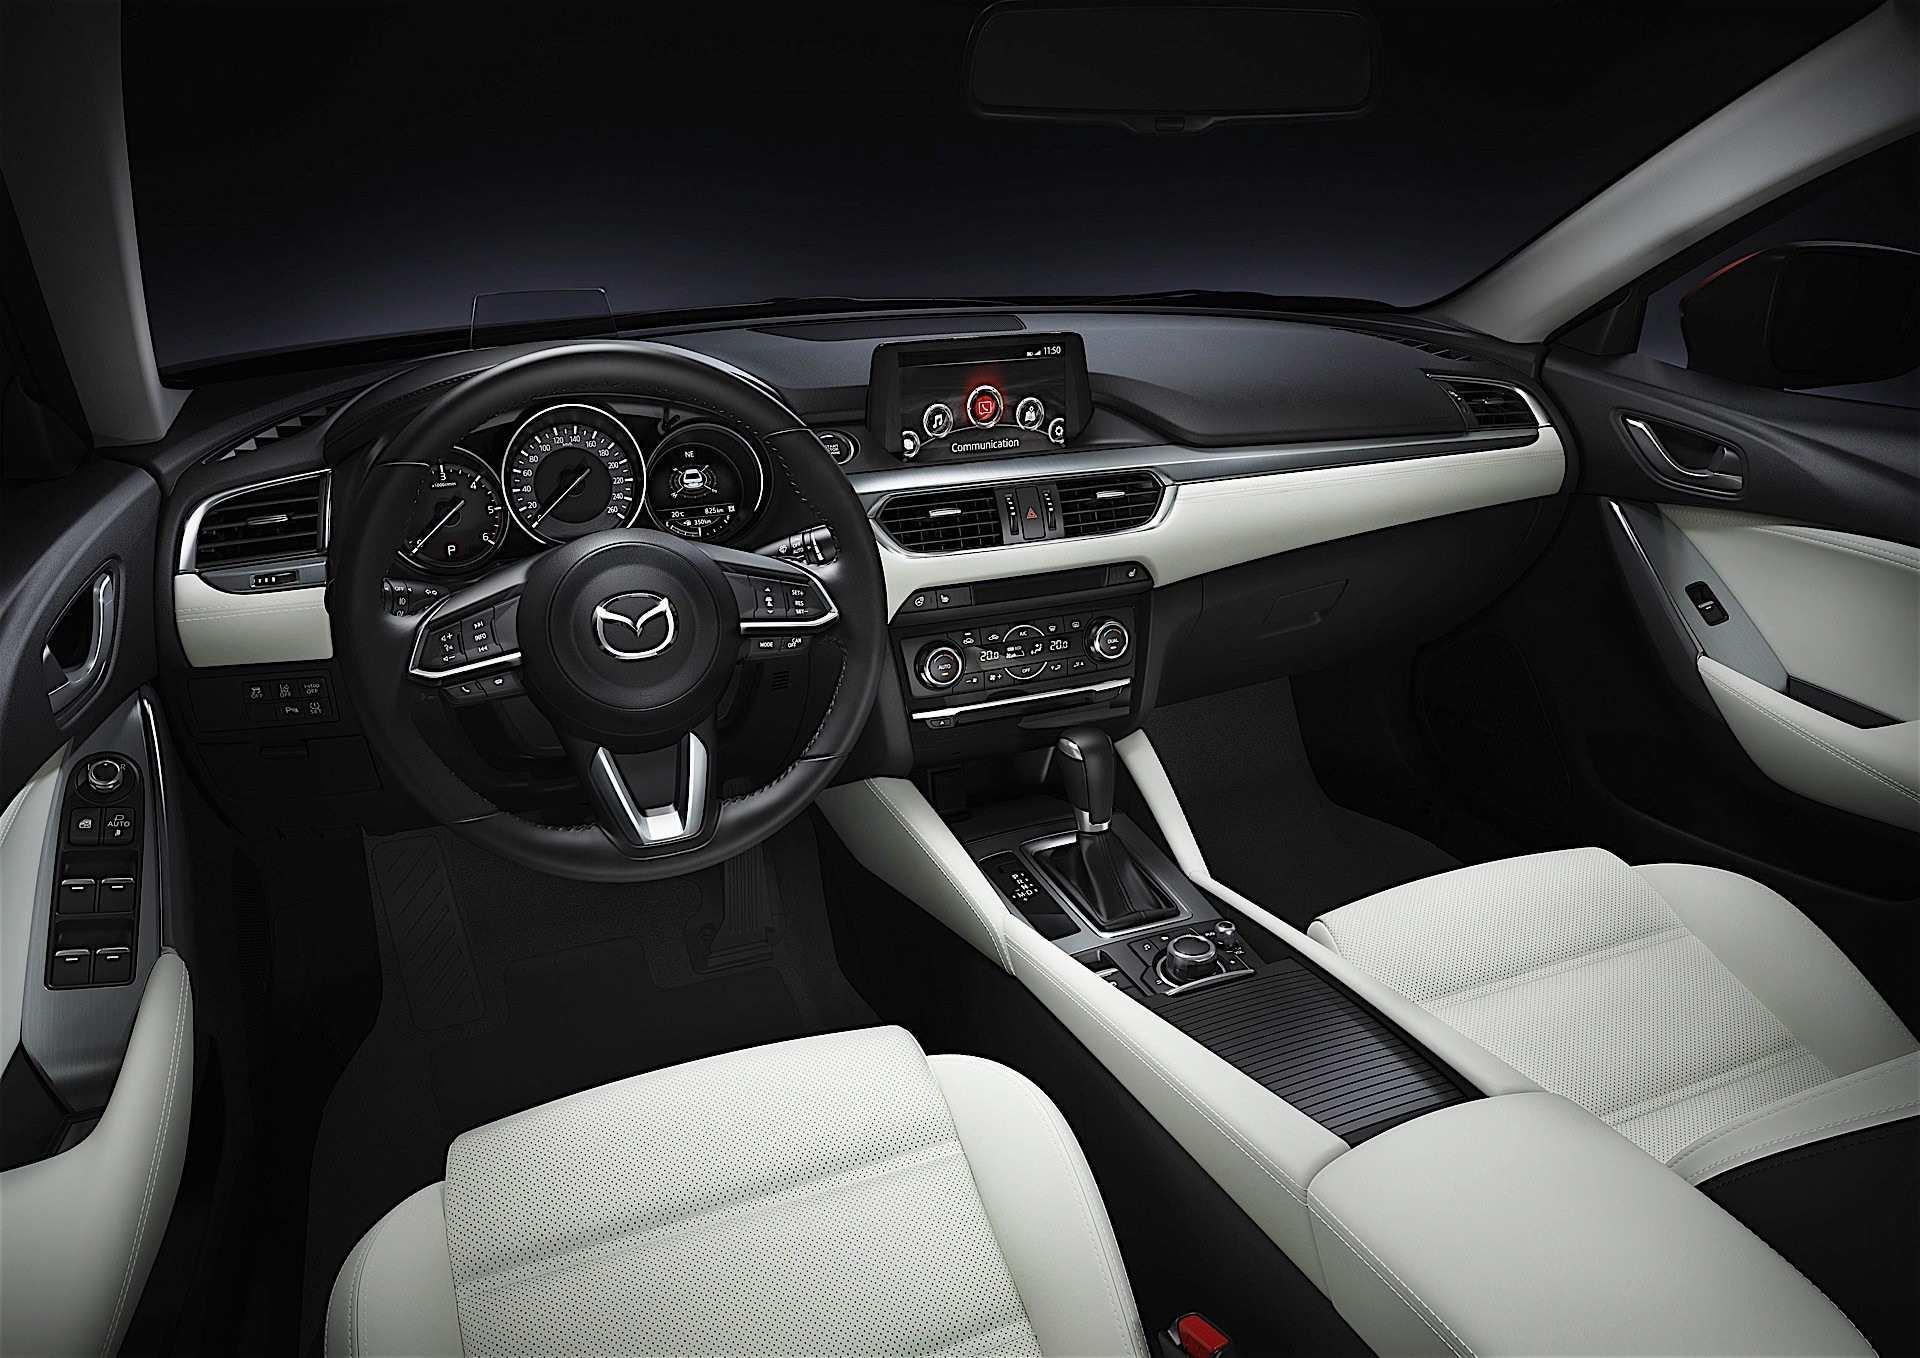 15 New Mazda 6 2020 White Configurations by Mazda 6 2020 White